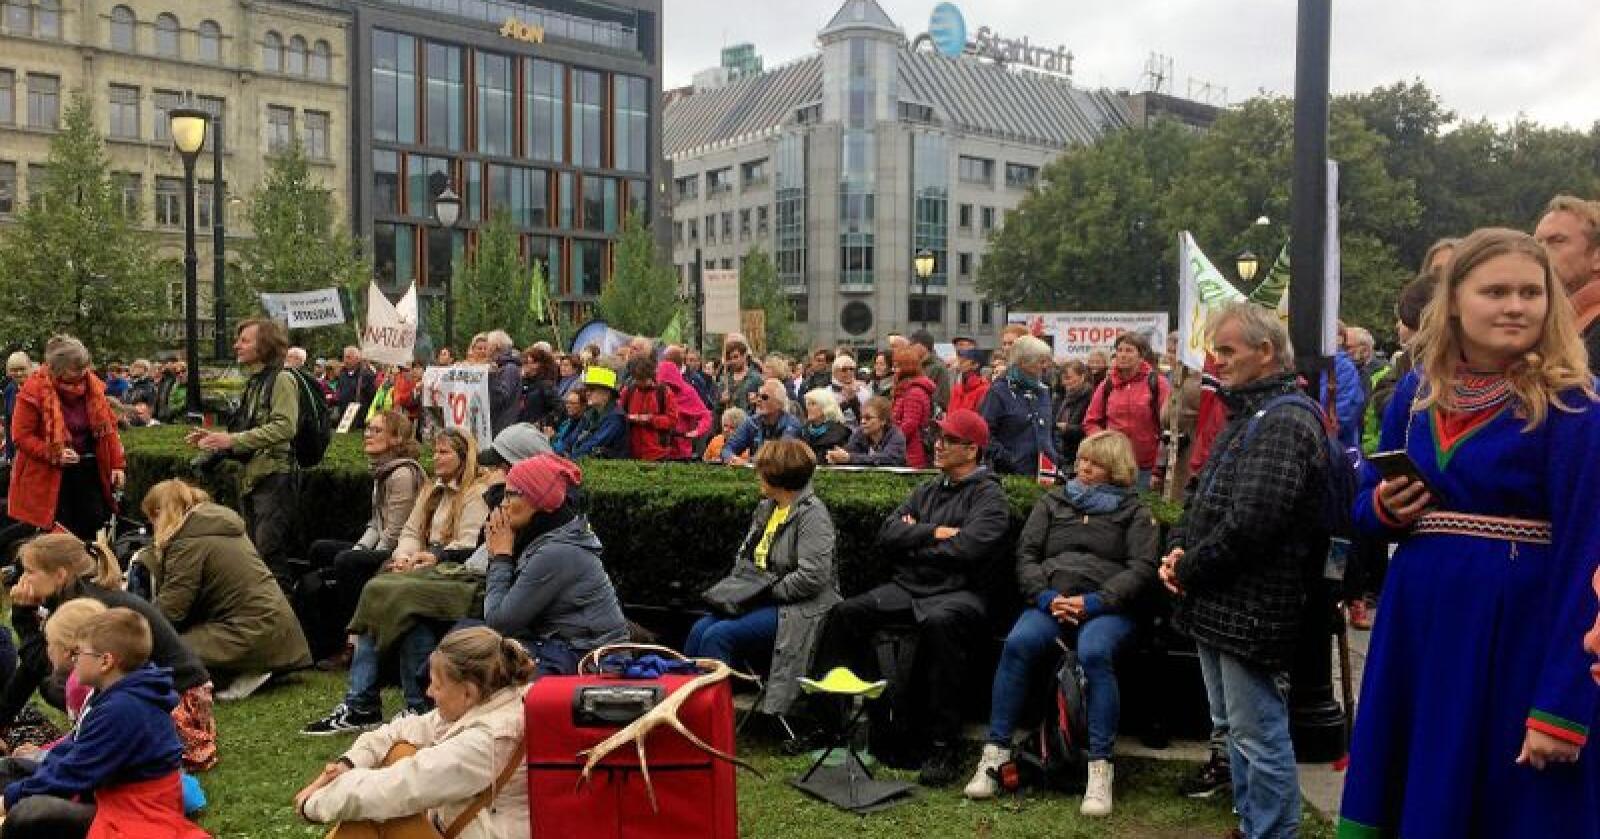 Foto: Beate Haugtrø / NPK